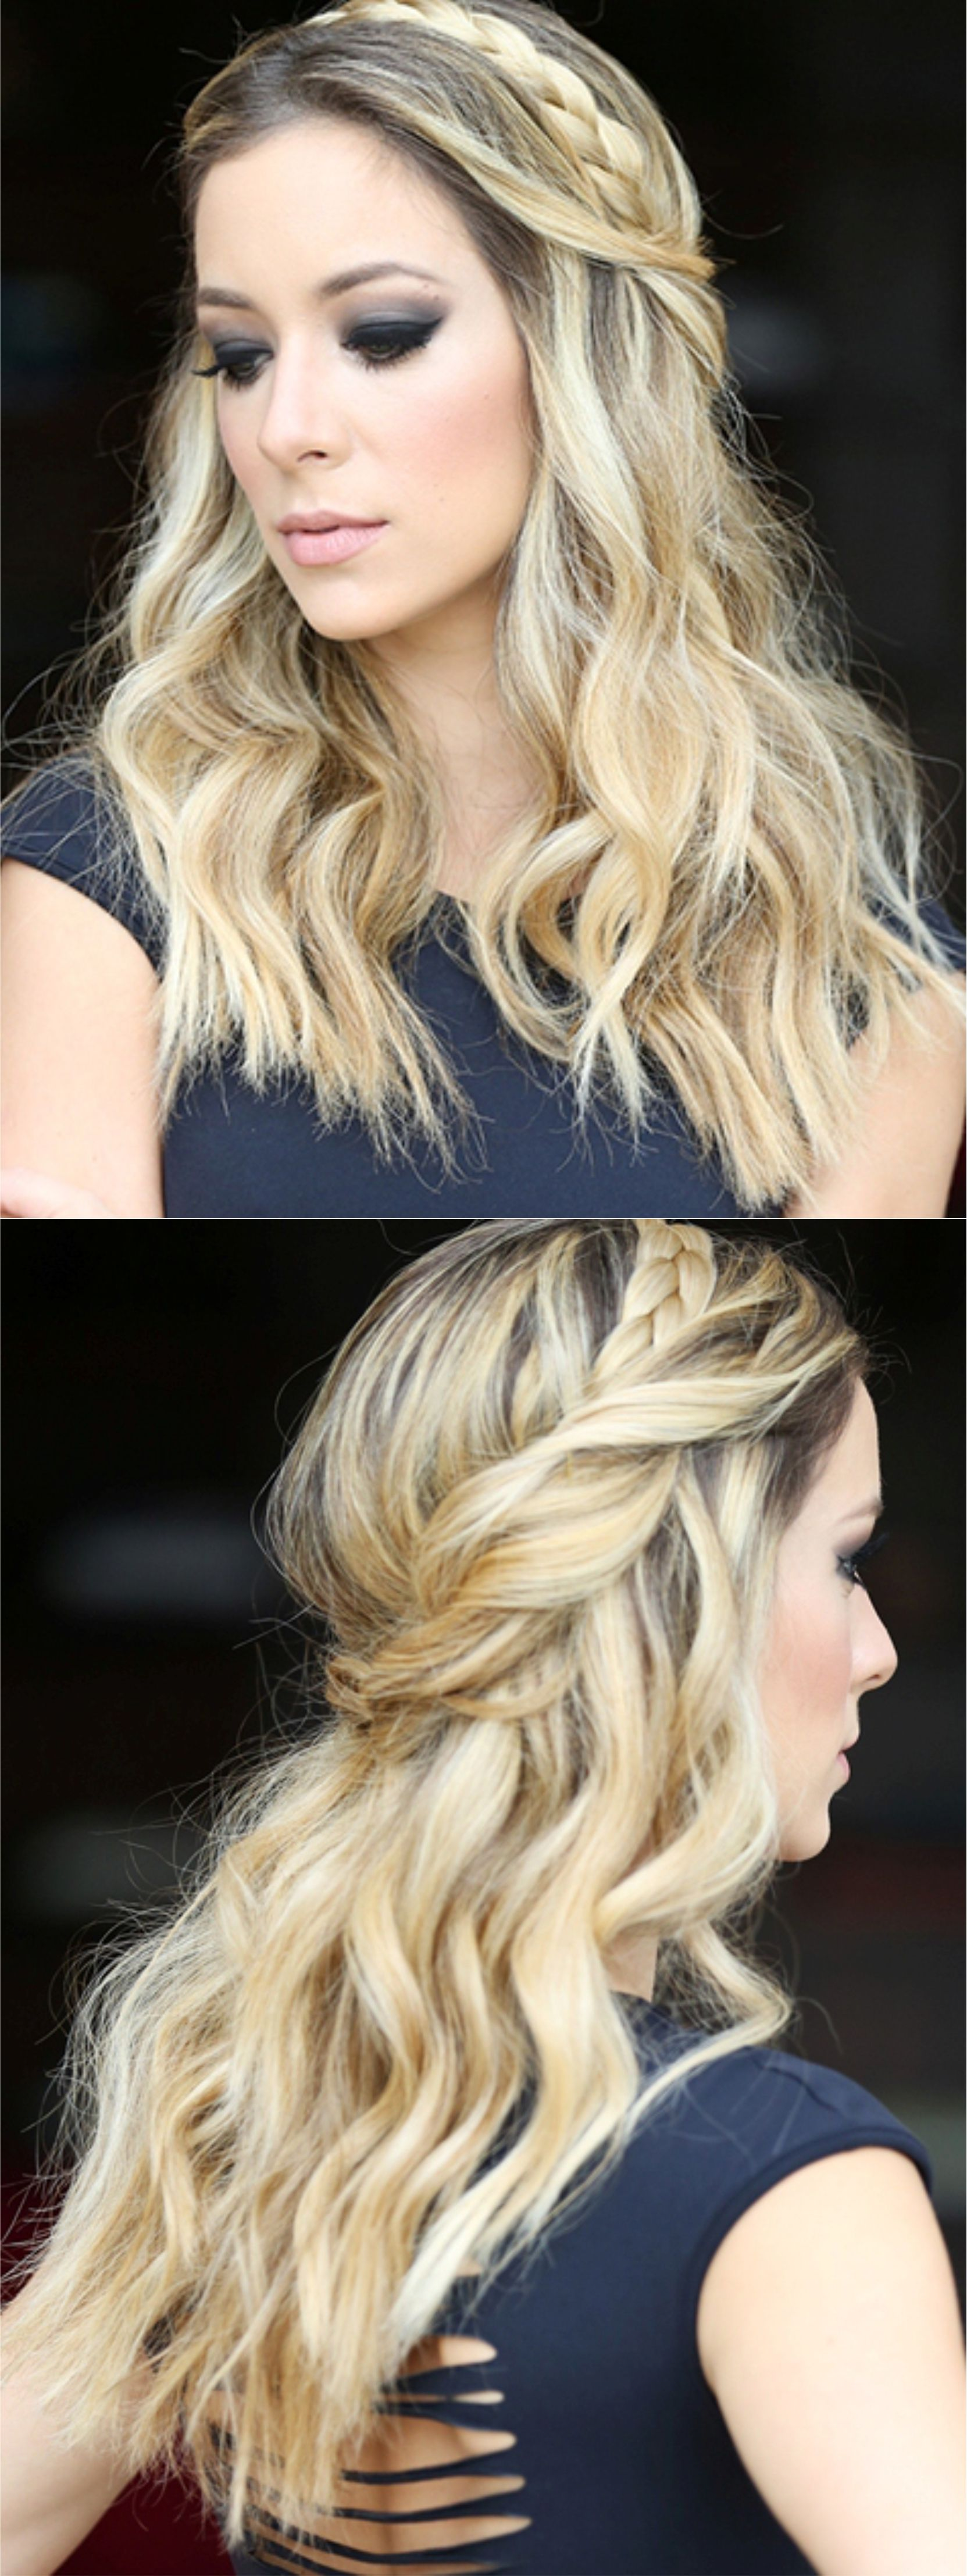 smokey eye and braided half up half down hairstyle ~ we ❤ this! moncheriprom.com #promhairstyles